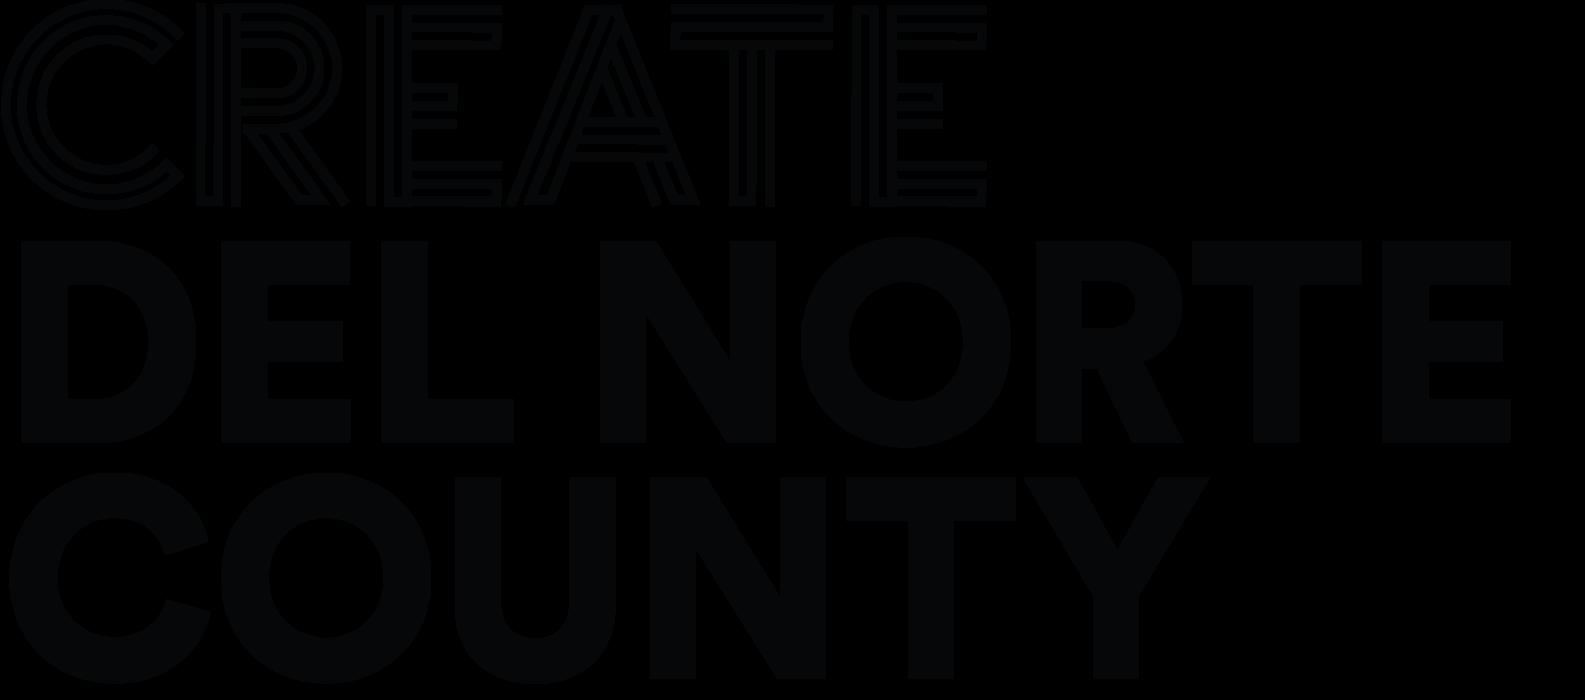 https://createca.org/wp-content/uploads/2020/01/Create-Ca-County-Logos-07-e1580493336694.png